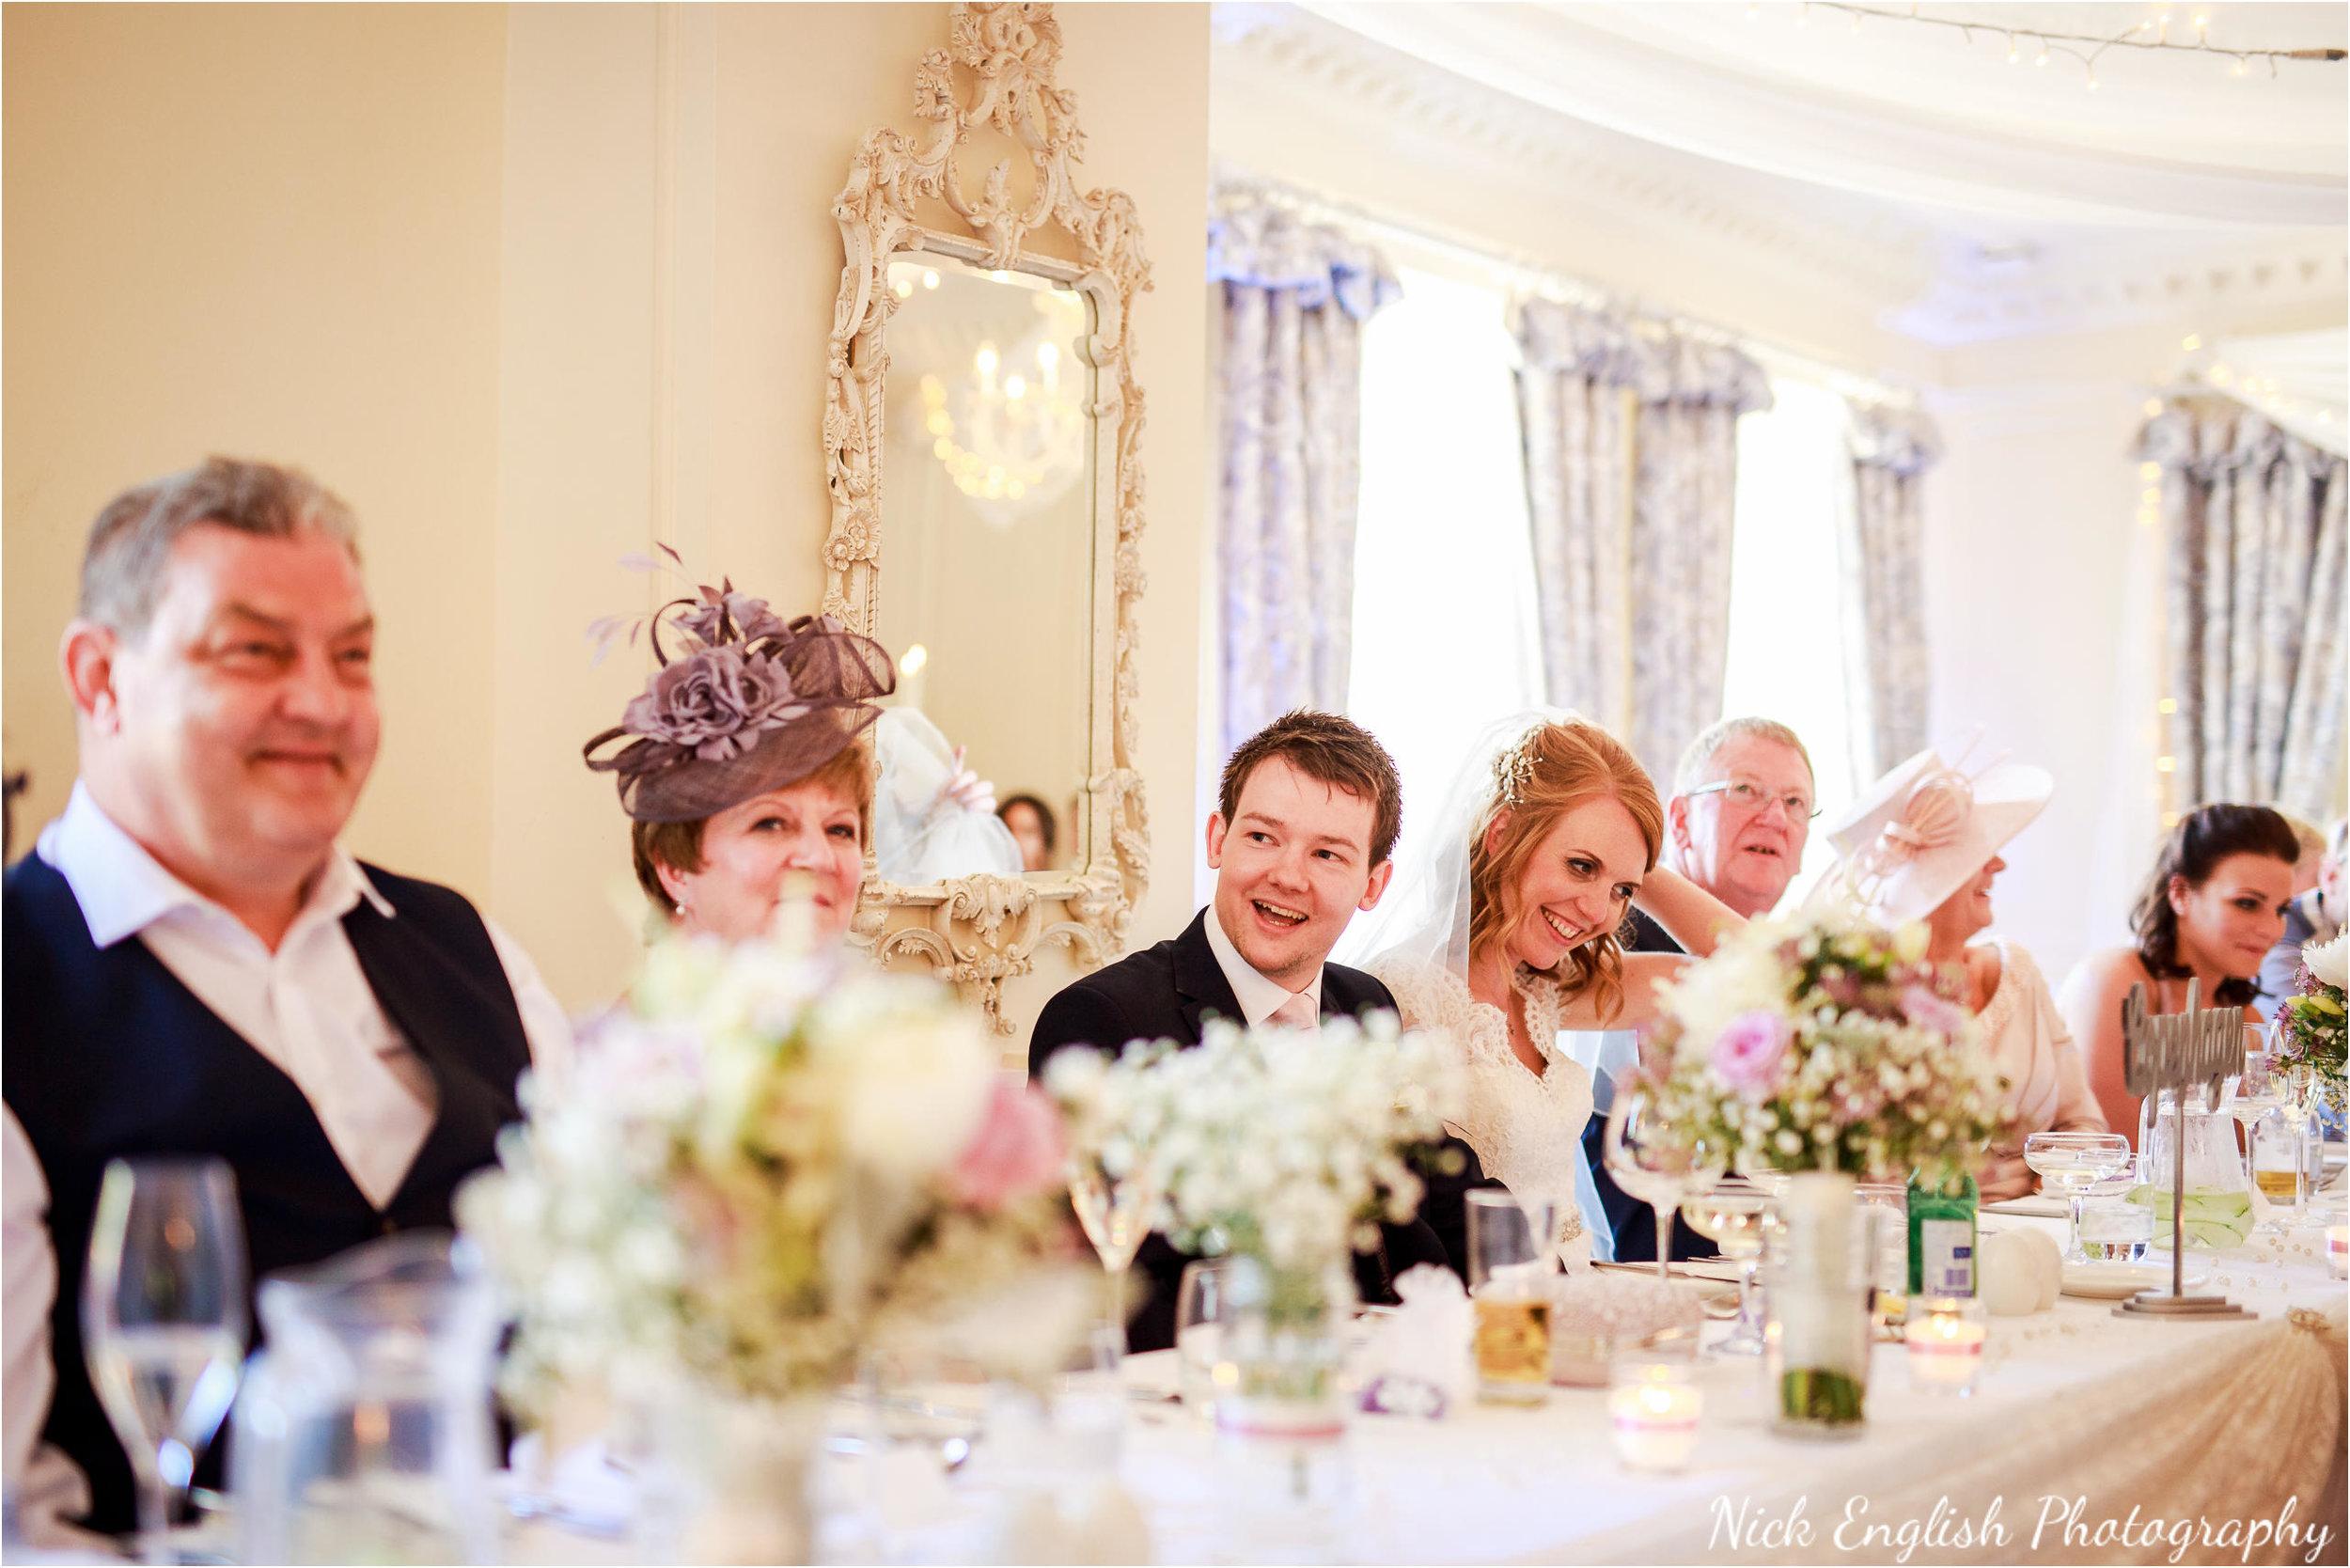 Alison James Wedding Photographs at Eaves Hall West Bradford 184jpg.jpeg